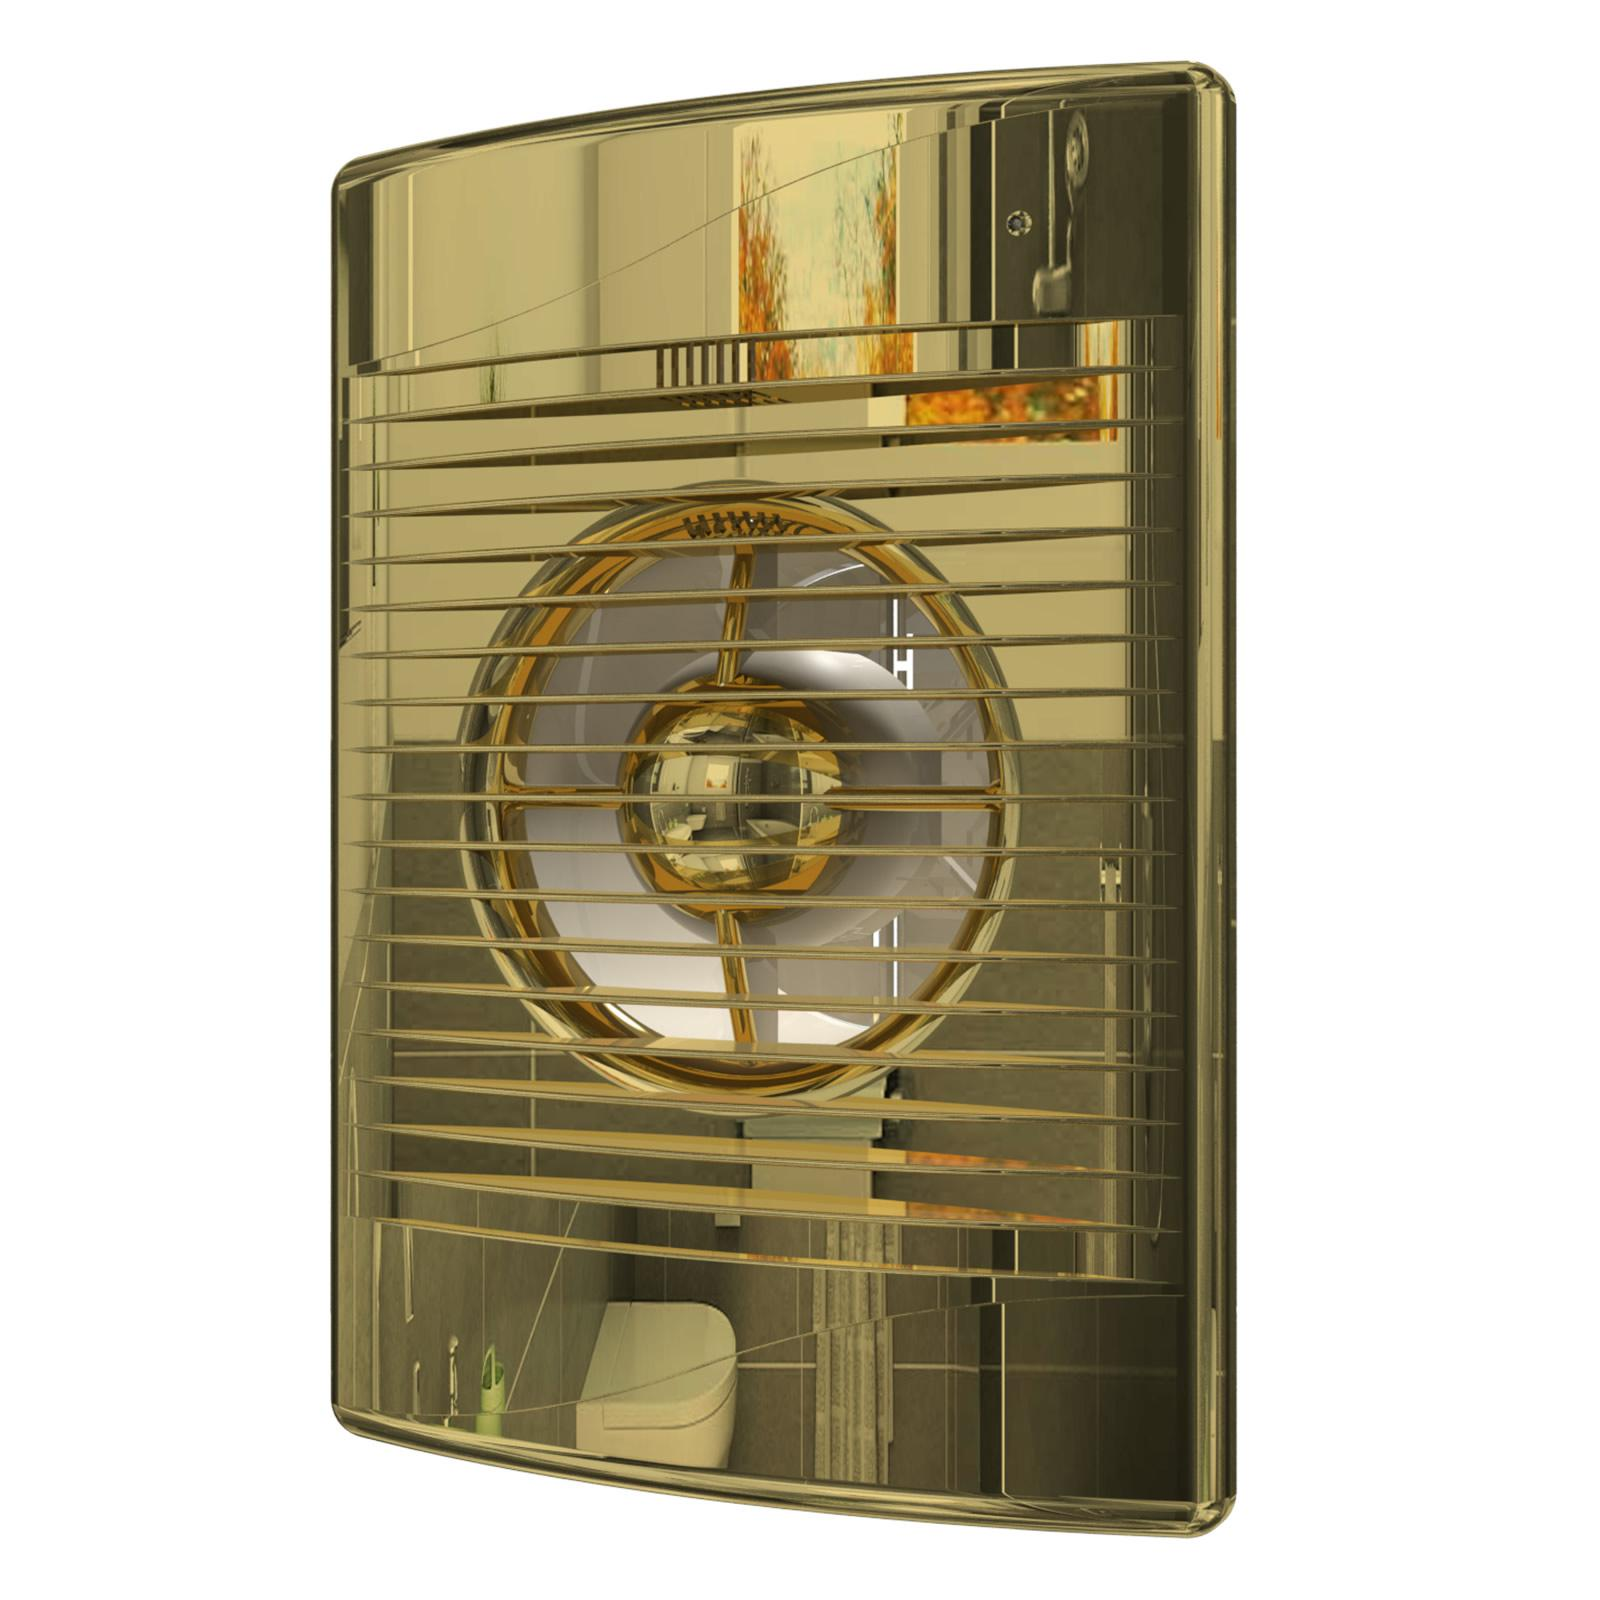 Вентилятор Diciti Standard 4c gold